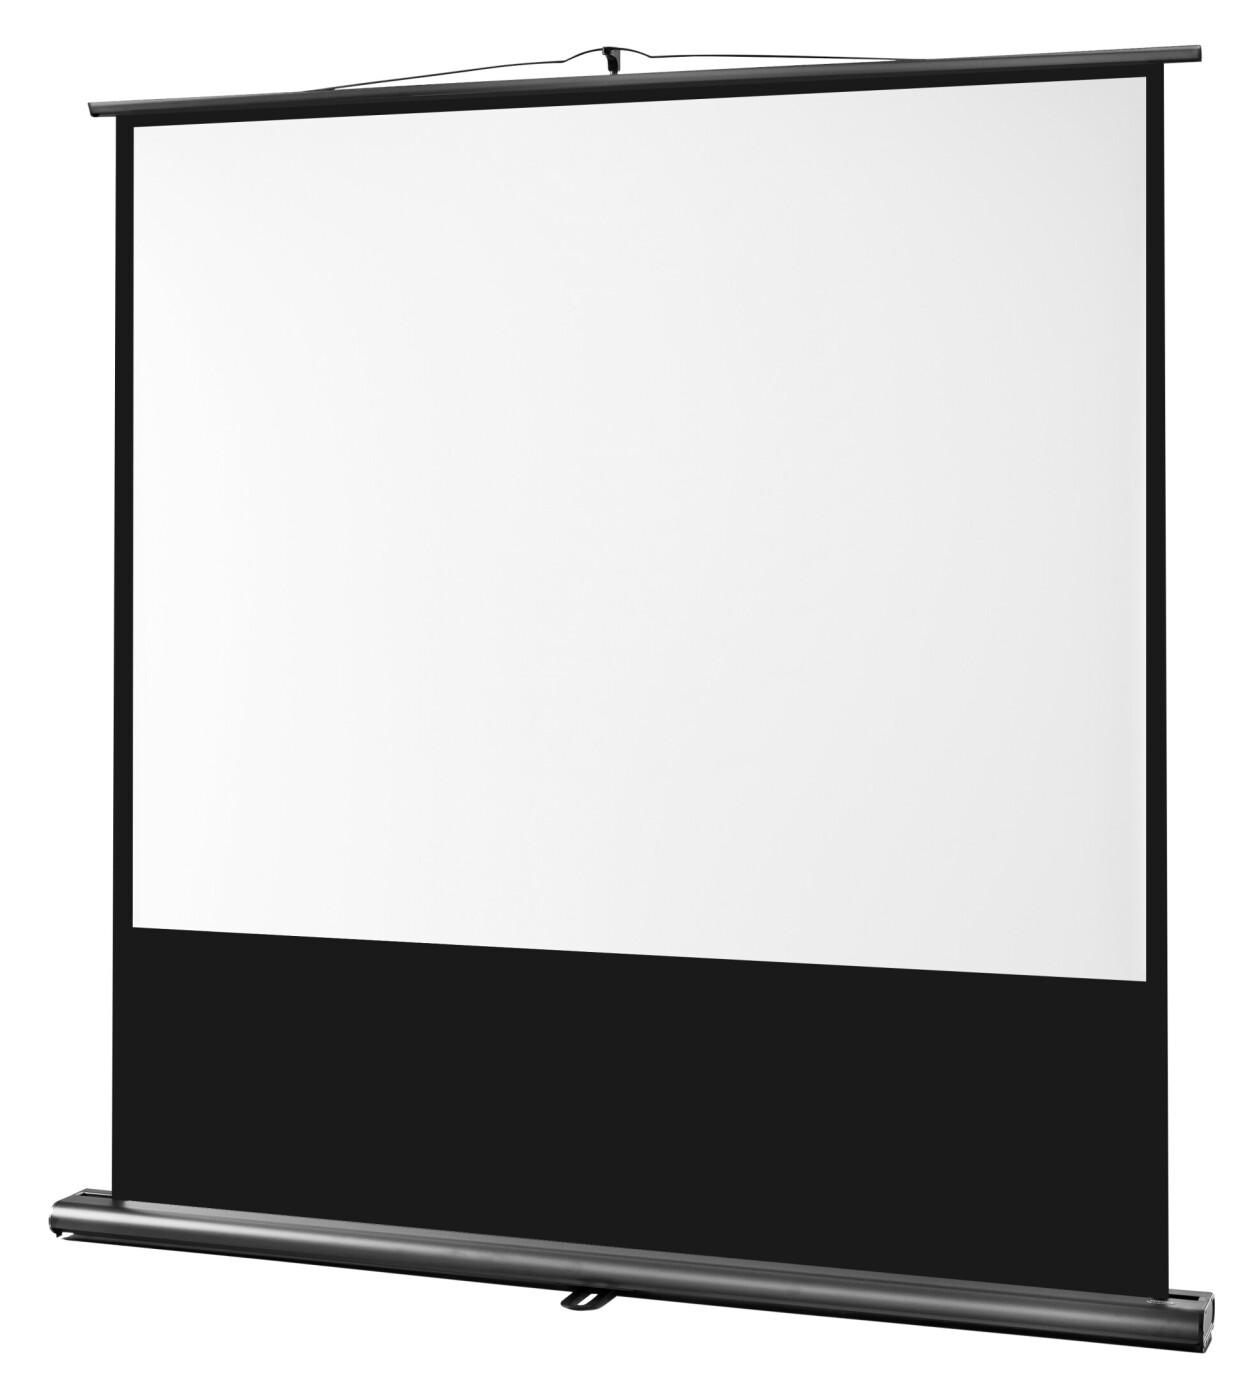 celexon Leinwand Ultramobil Professional 160 x 120 cm